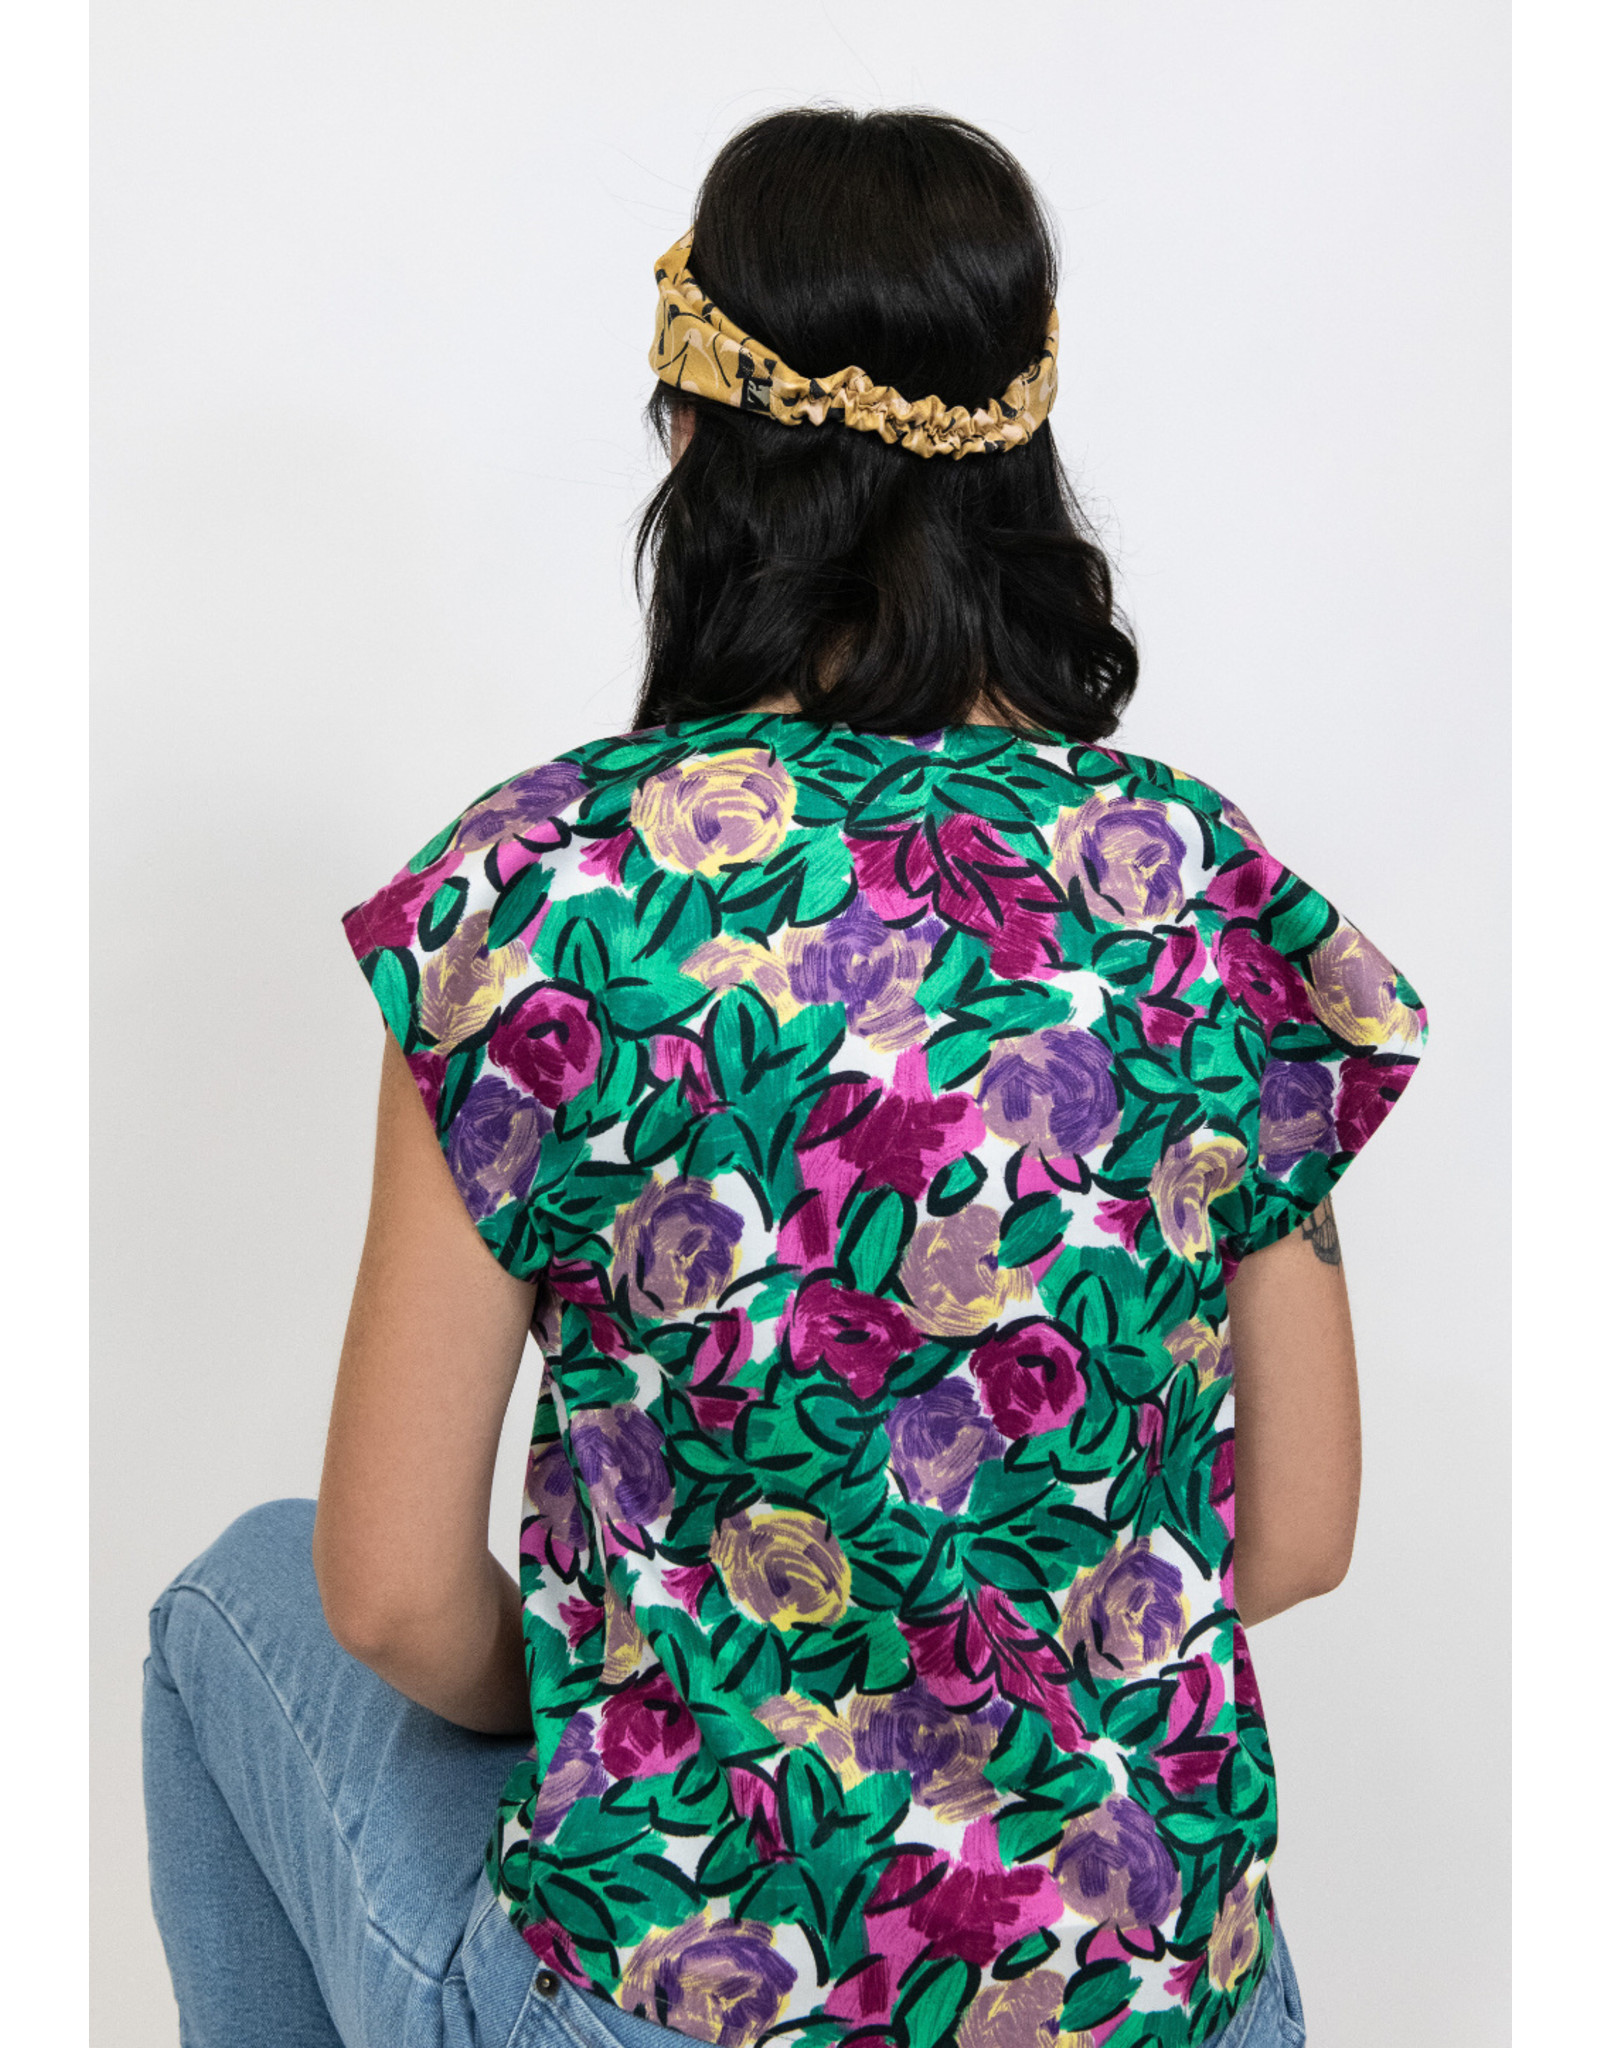 Kazak Haut La Gadelle fleurs fushia